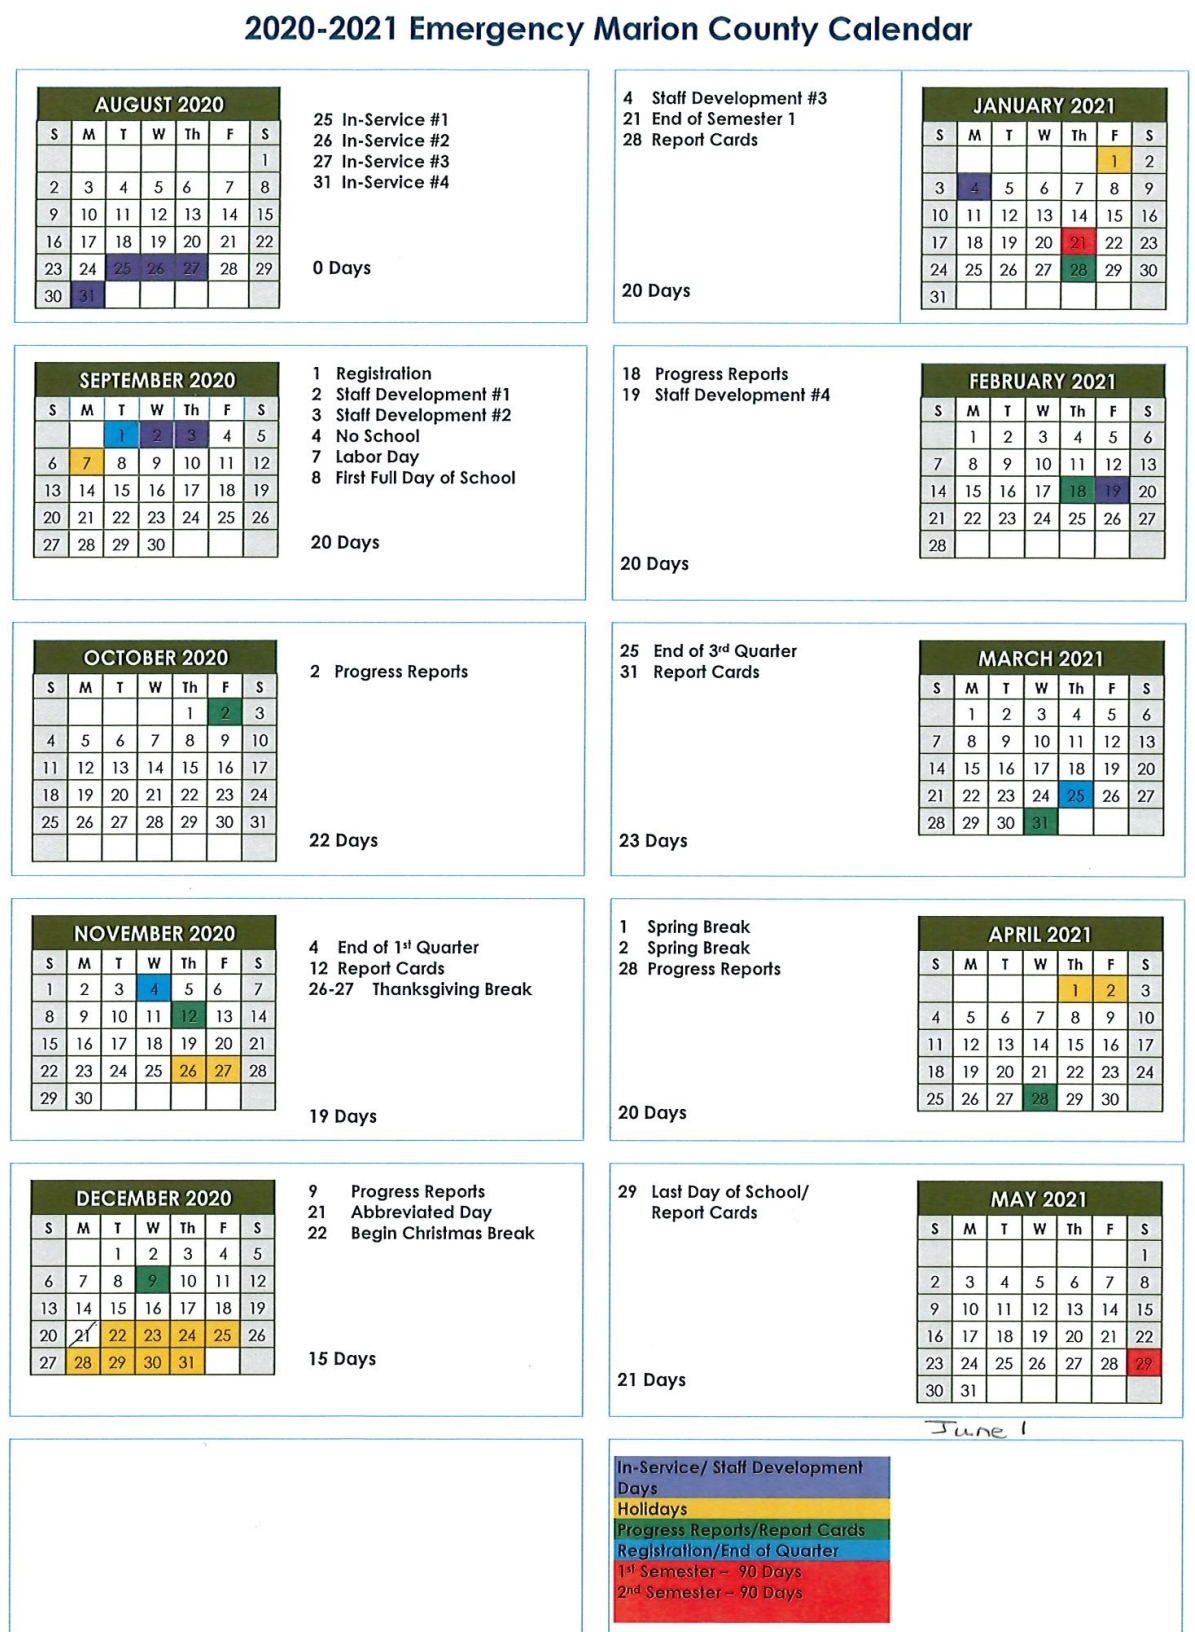 2020-2021 Marion County School Calendar